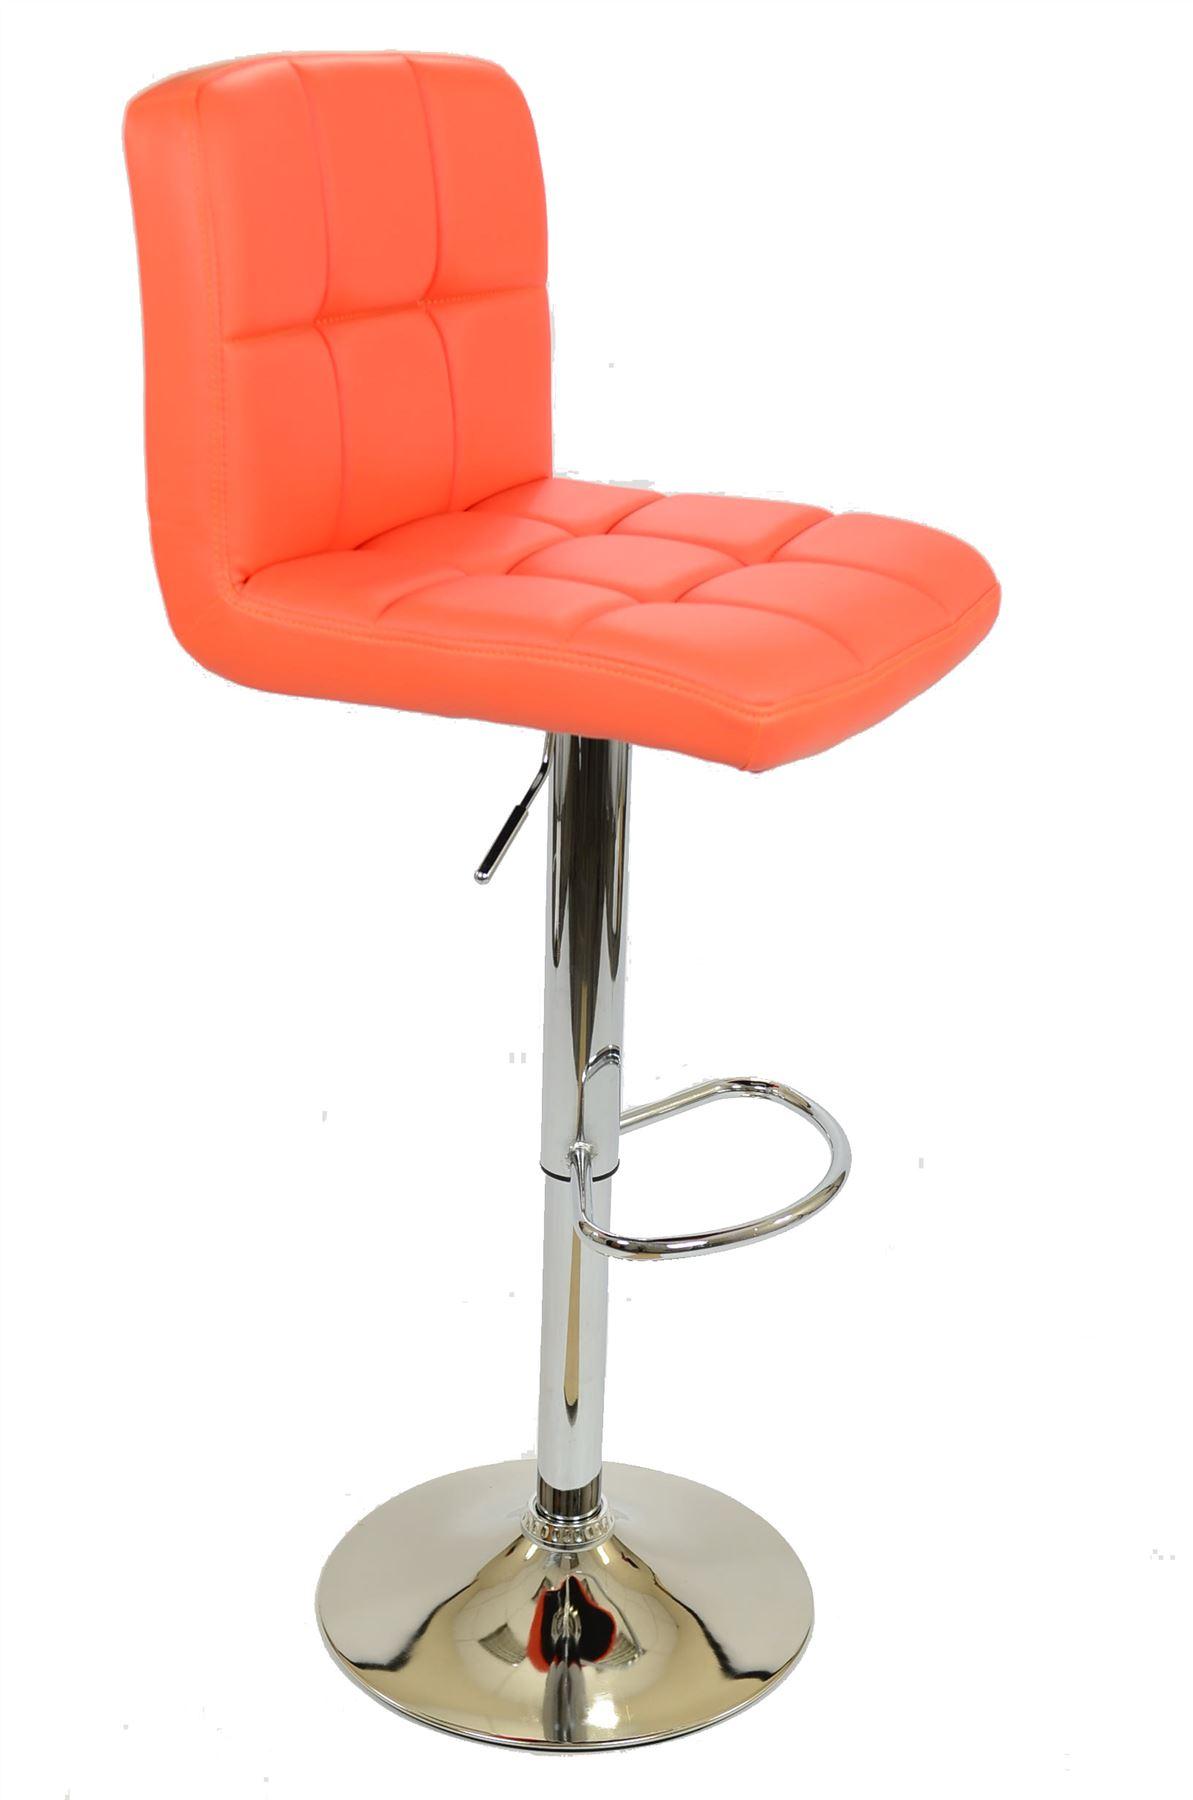 cuban faux leather swivel gas lift barstool bar stools ebay. Black Bedroom Furniture Sets. Home Design Ideas